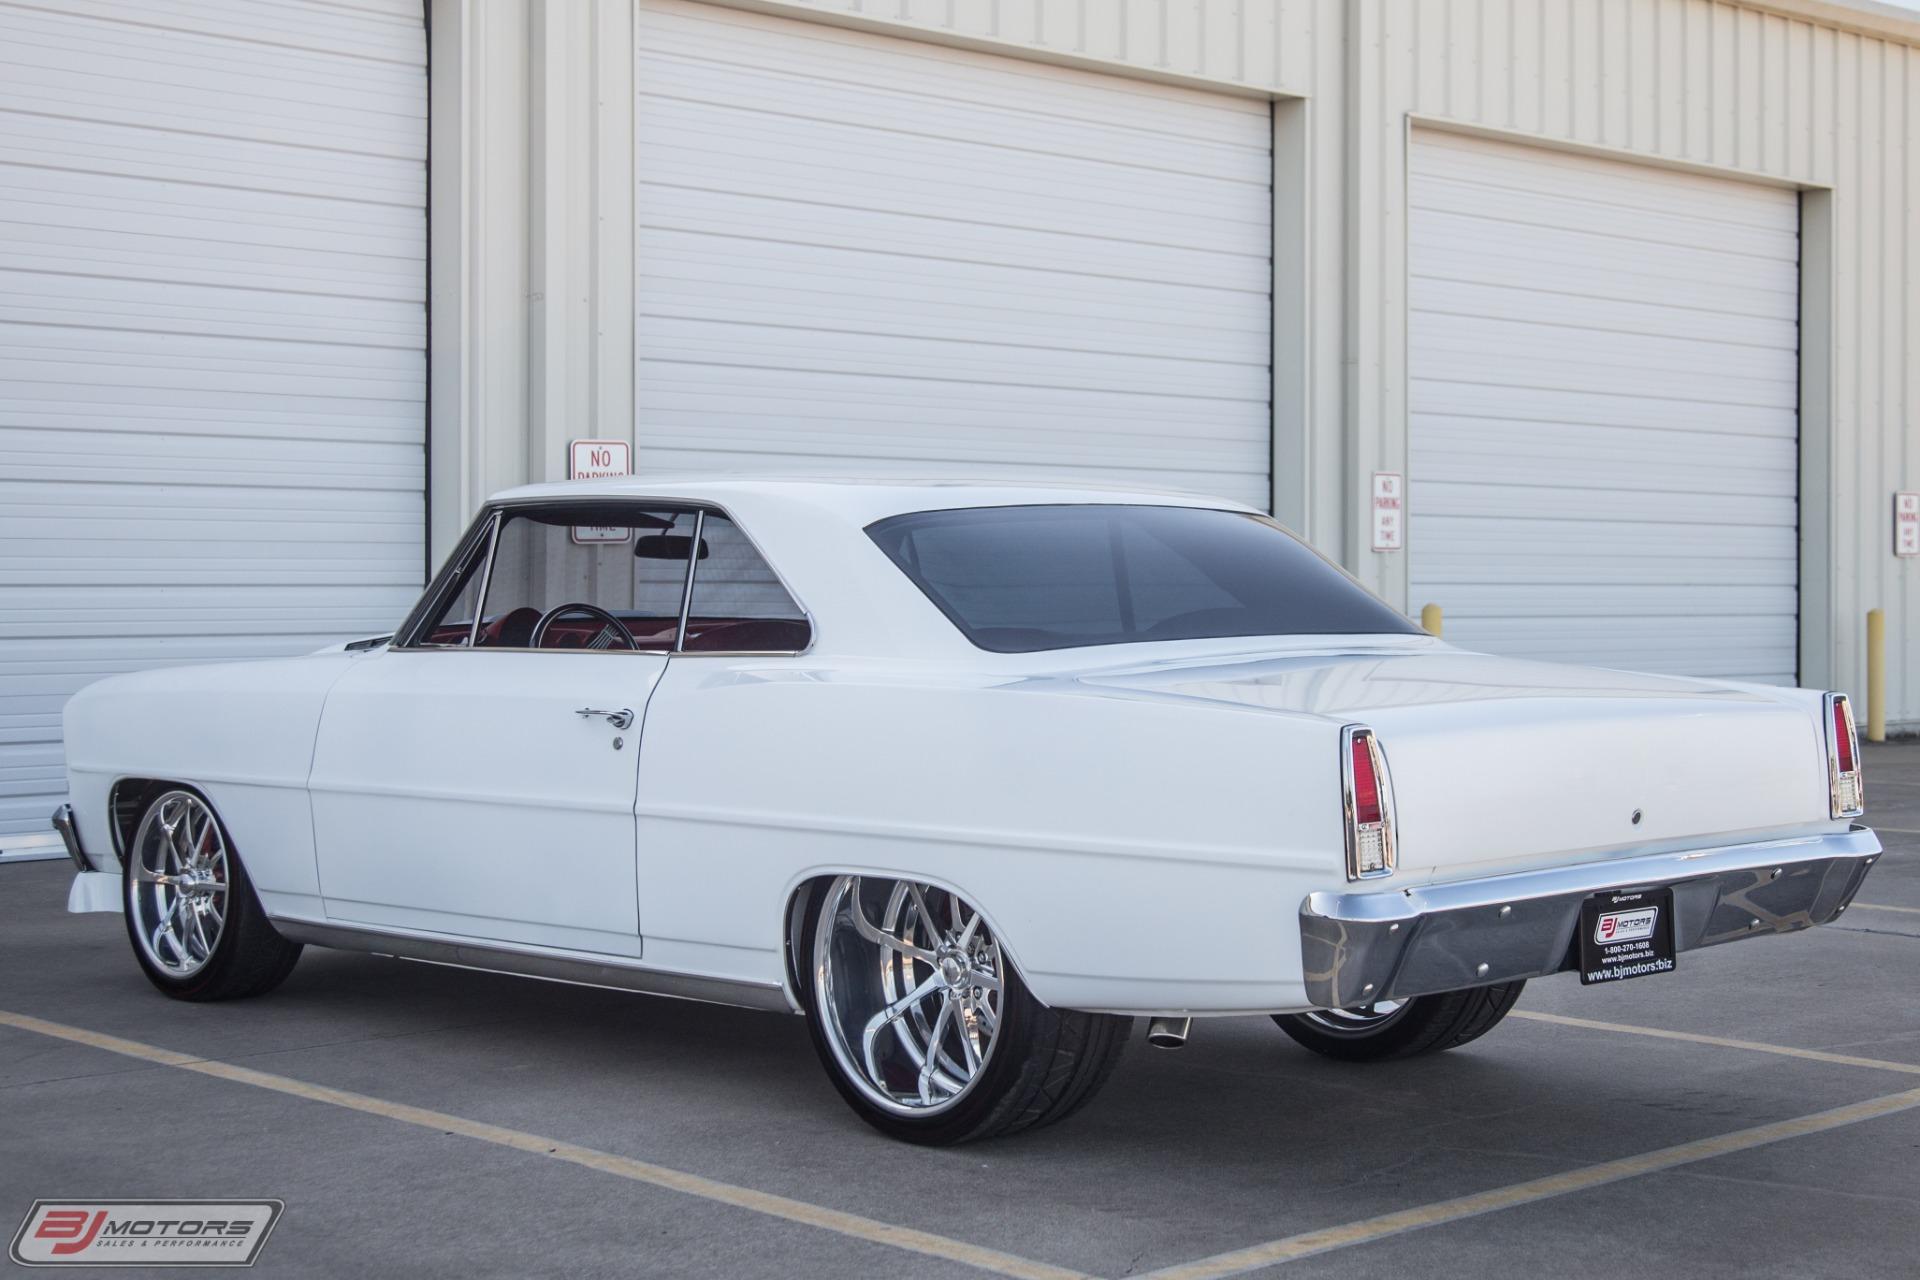 Used-1966-Chevrolet-Nova-Resto-Mod